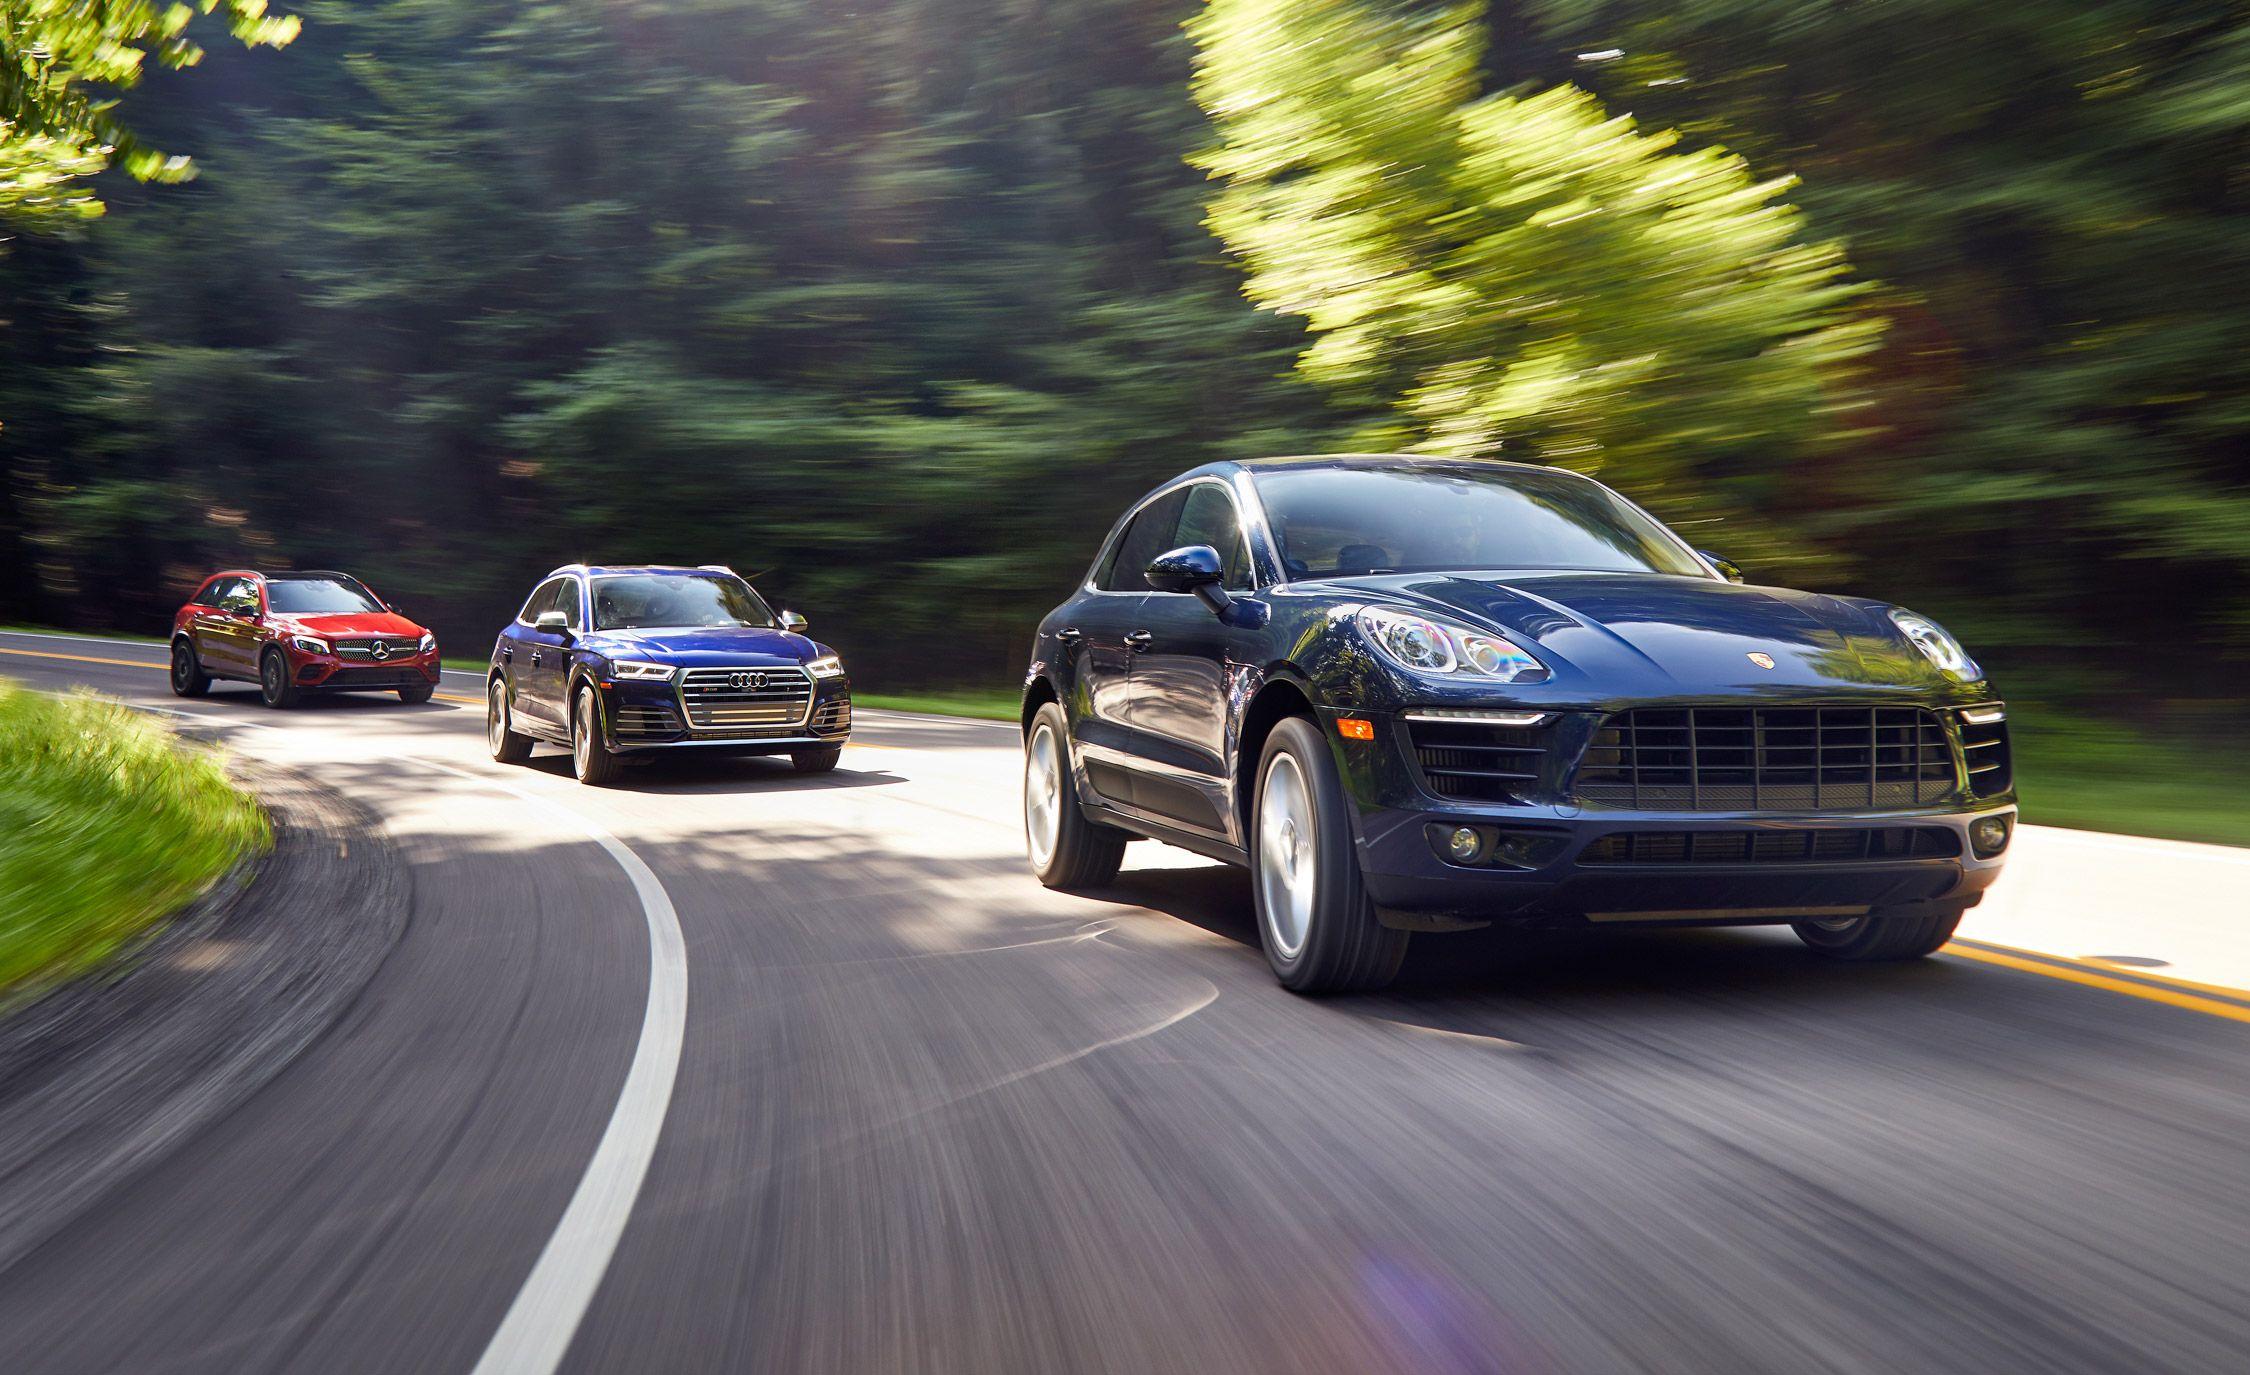 Porsche macan comparison